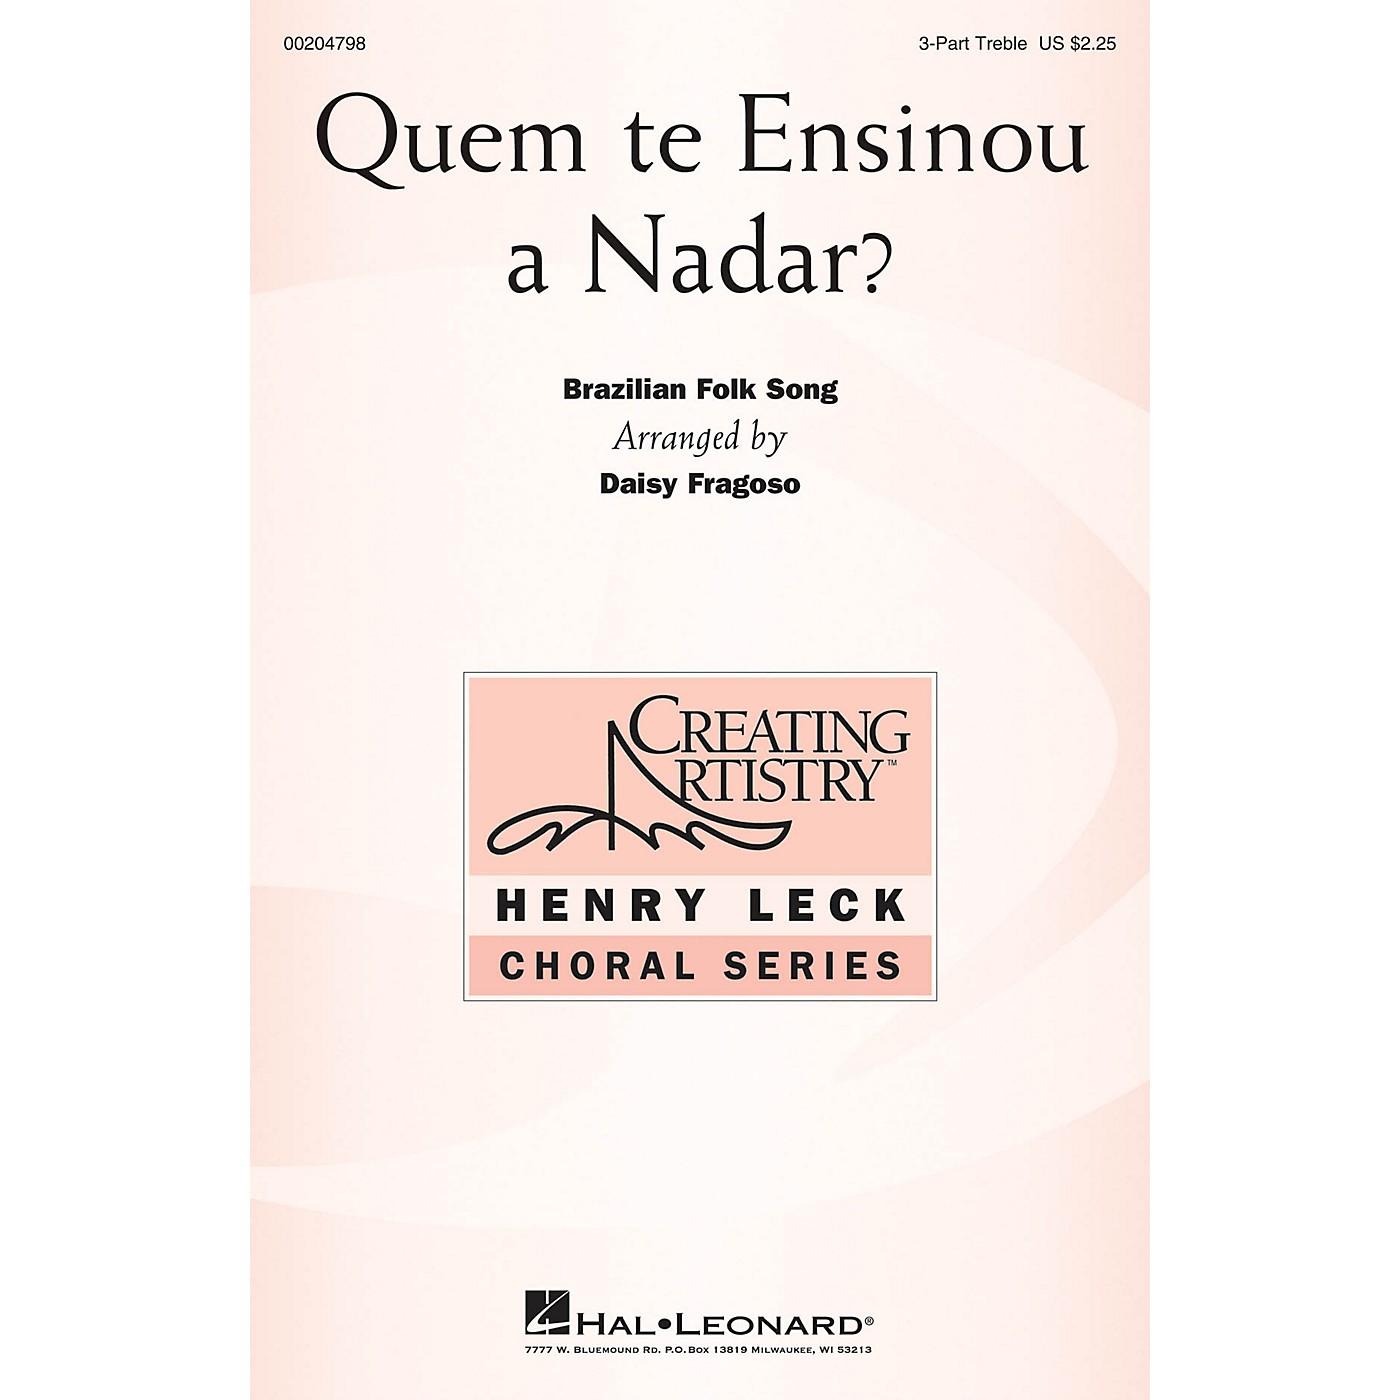 Hal Leonard Quem te Ensinou a Nadar? 3 Part Treble arranged by Daisy Fragoso thumbnail